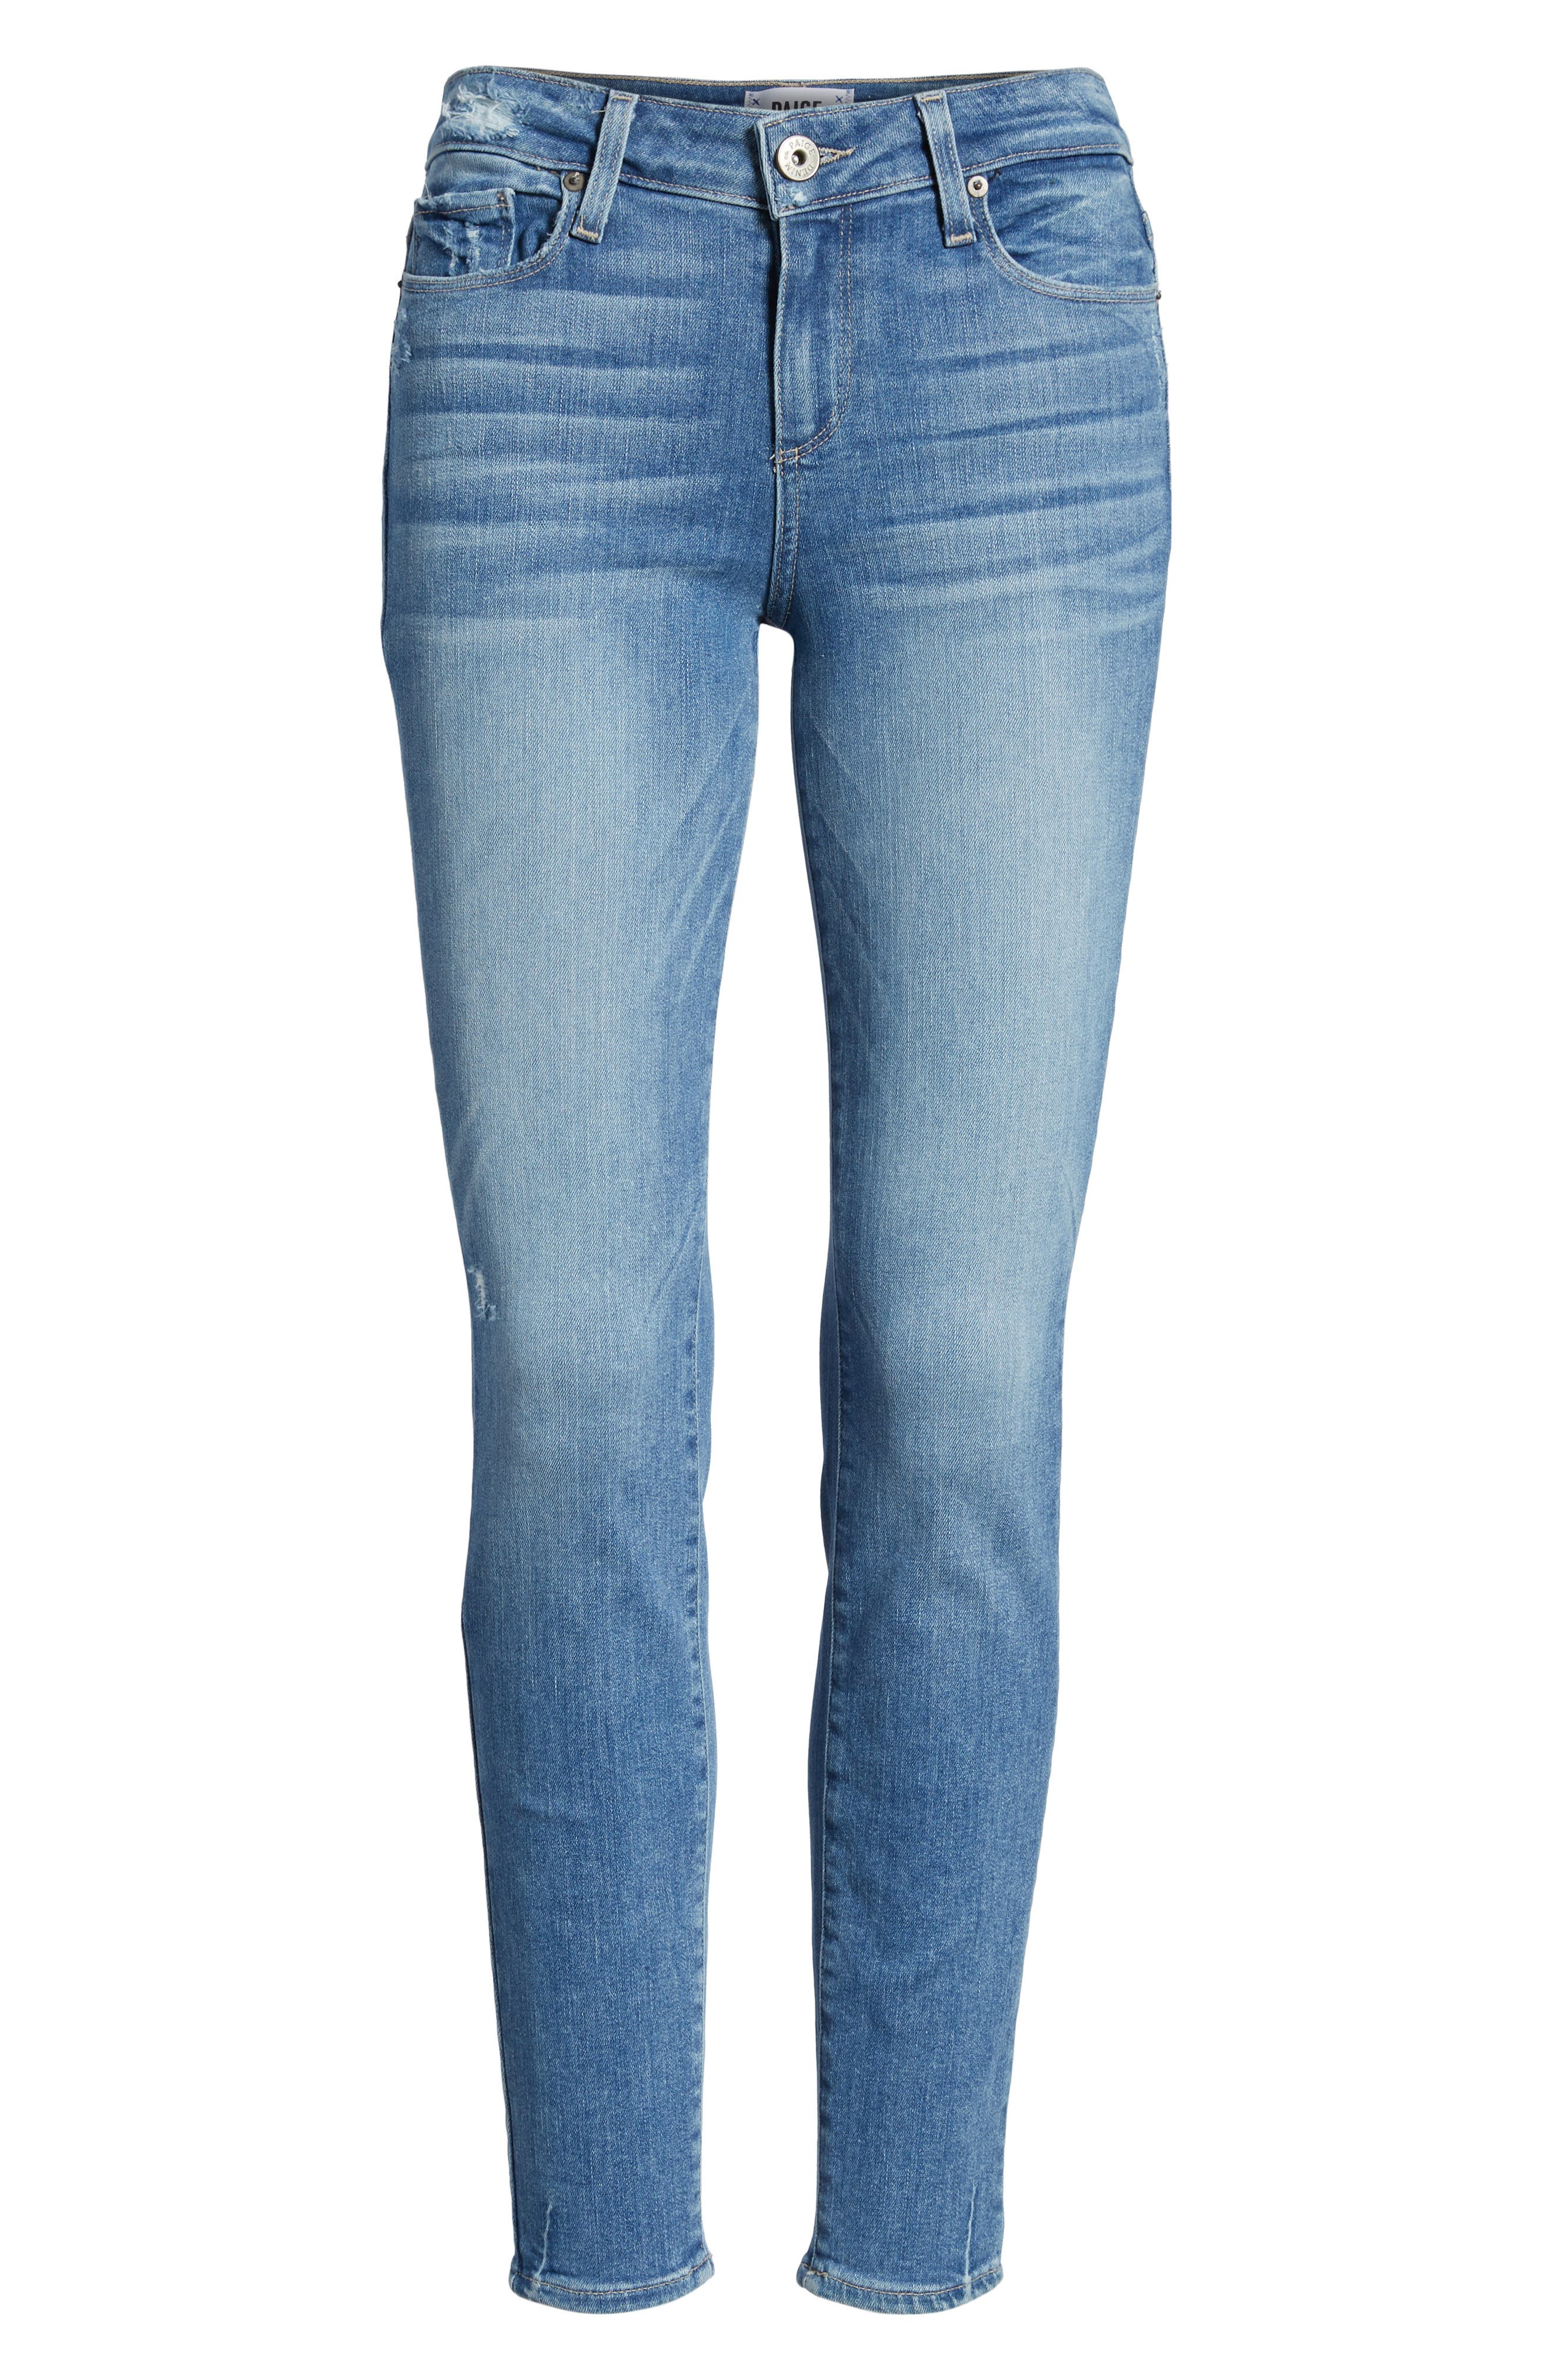 Transcend Vintage - Verdugo Ultra Skinny Jeans,                             Alternate thumbnail 6, color,                             400